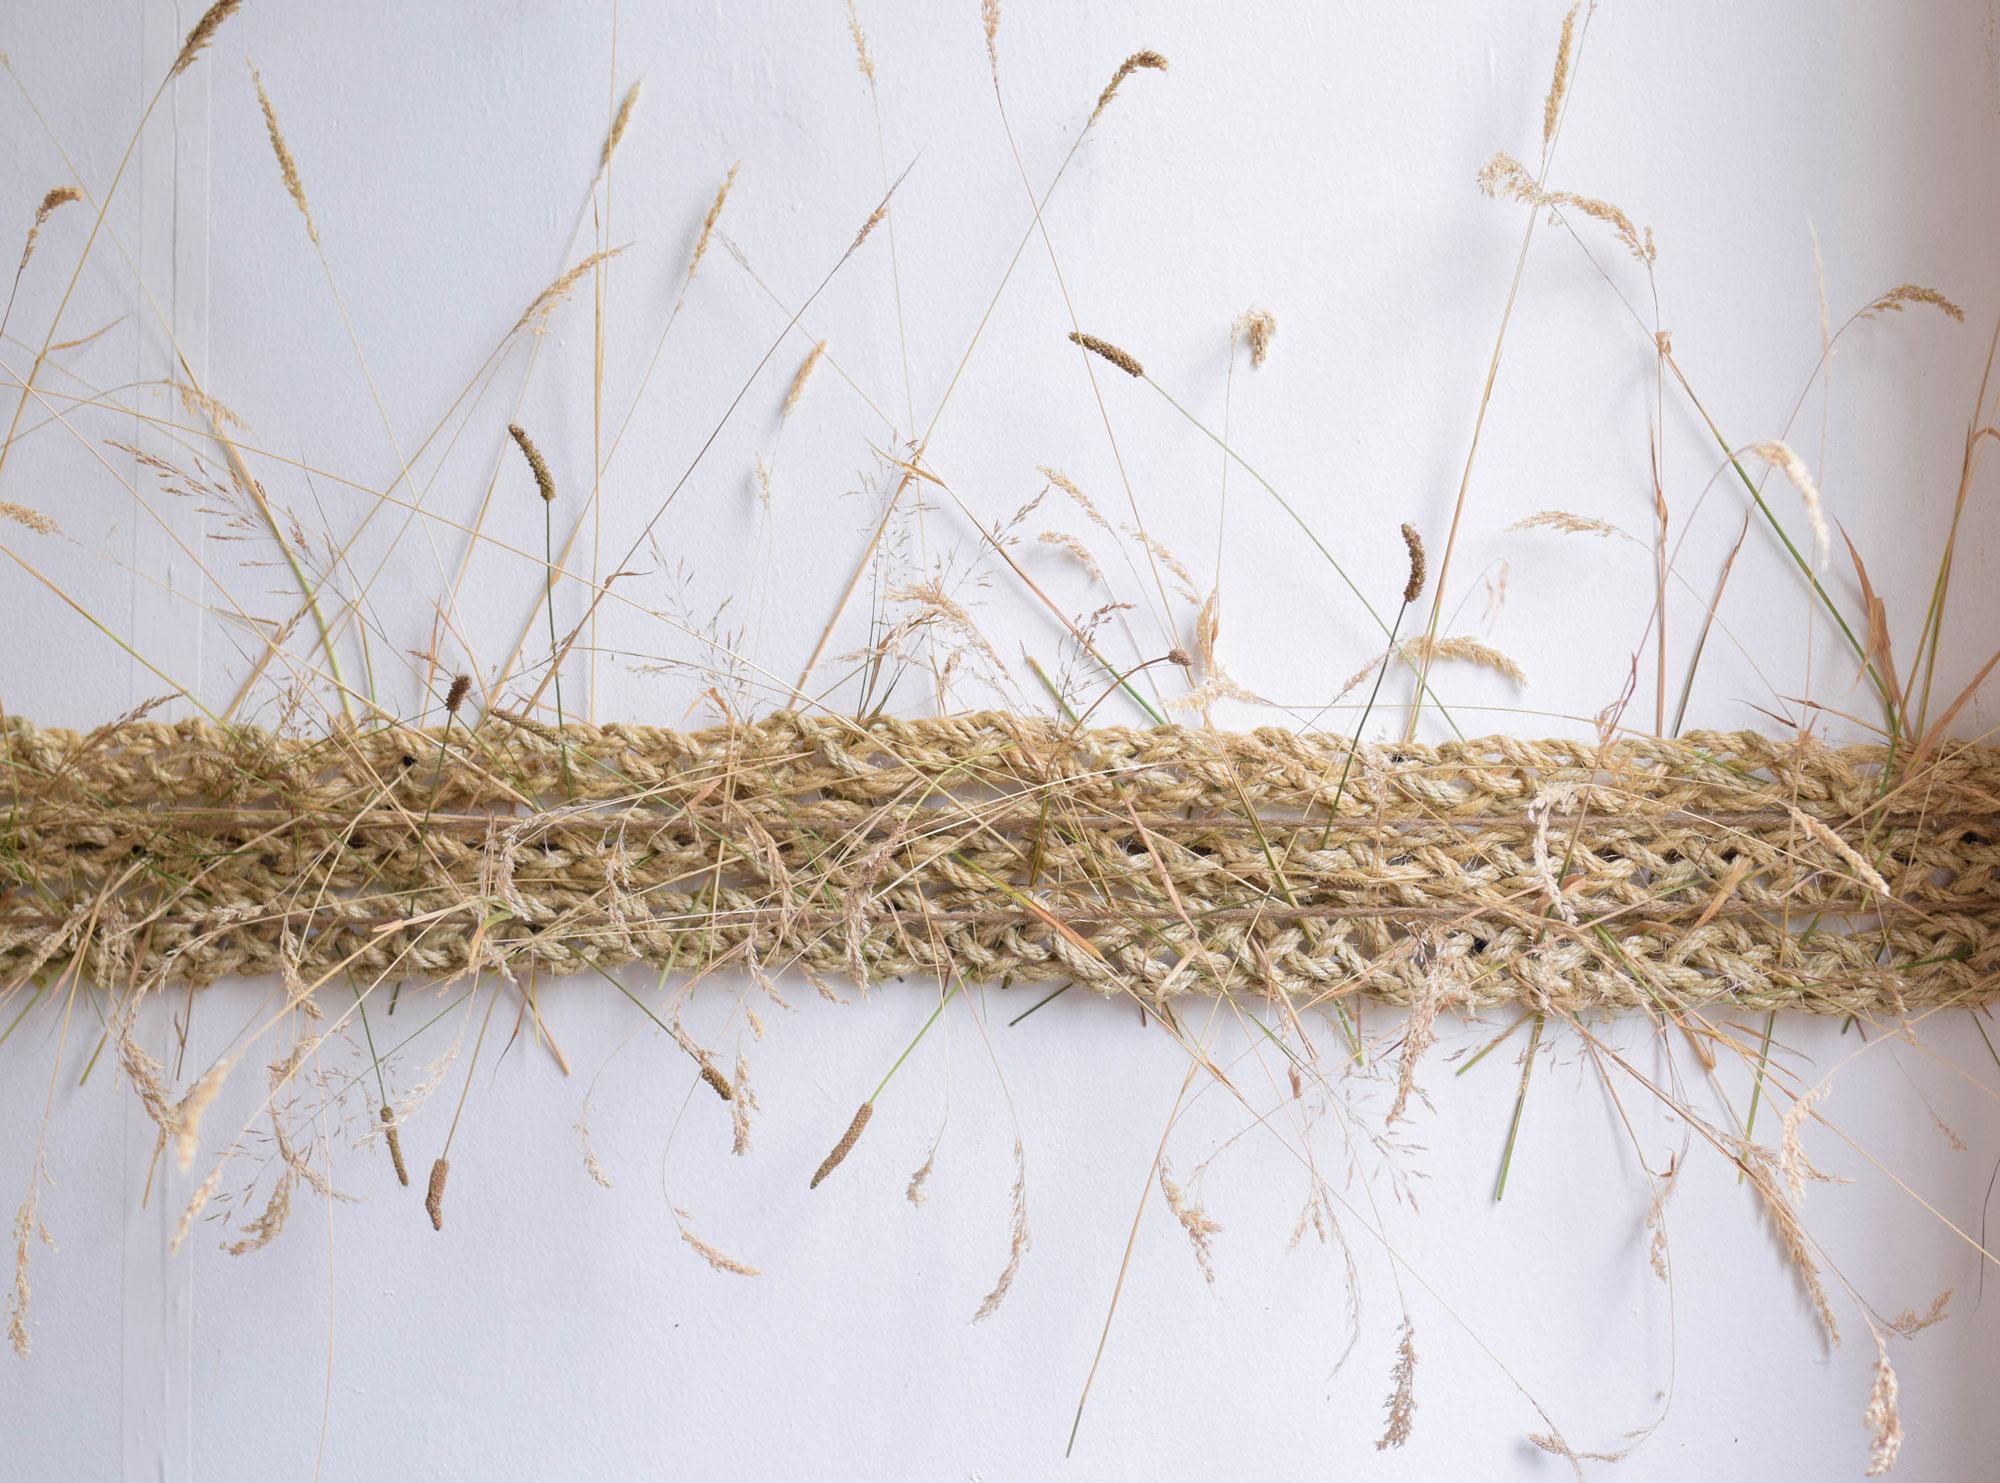 BBJ-Photoshoot--Curious-Lola---Grass-(3)